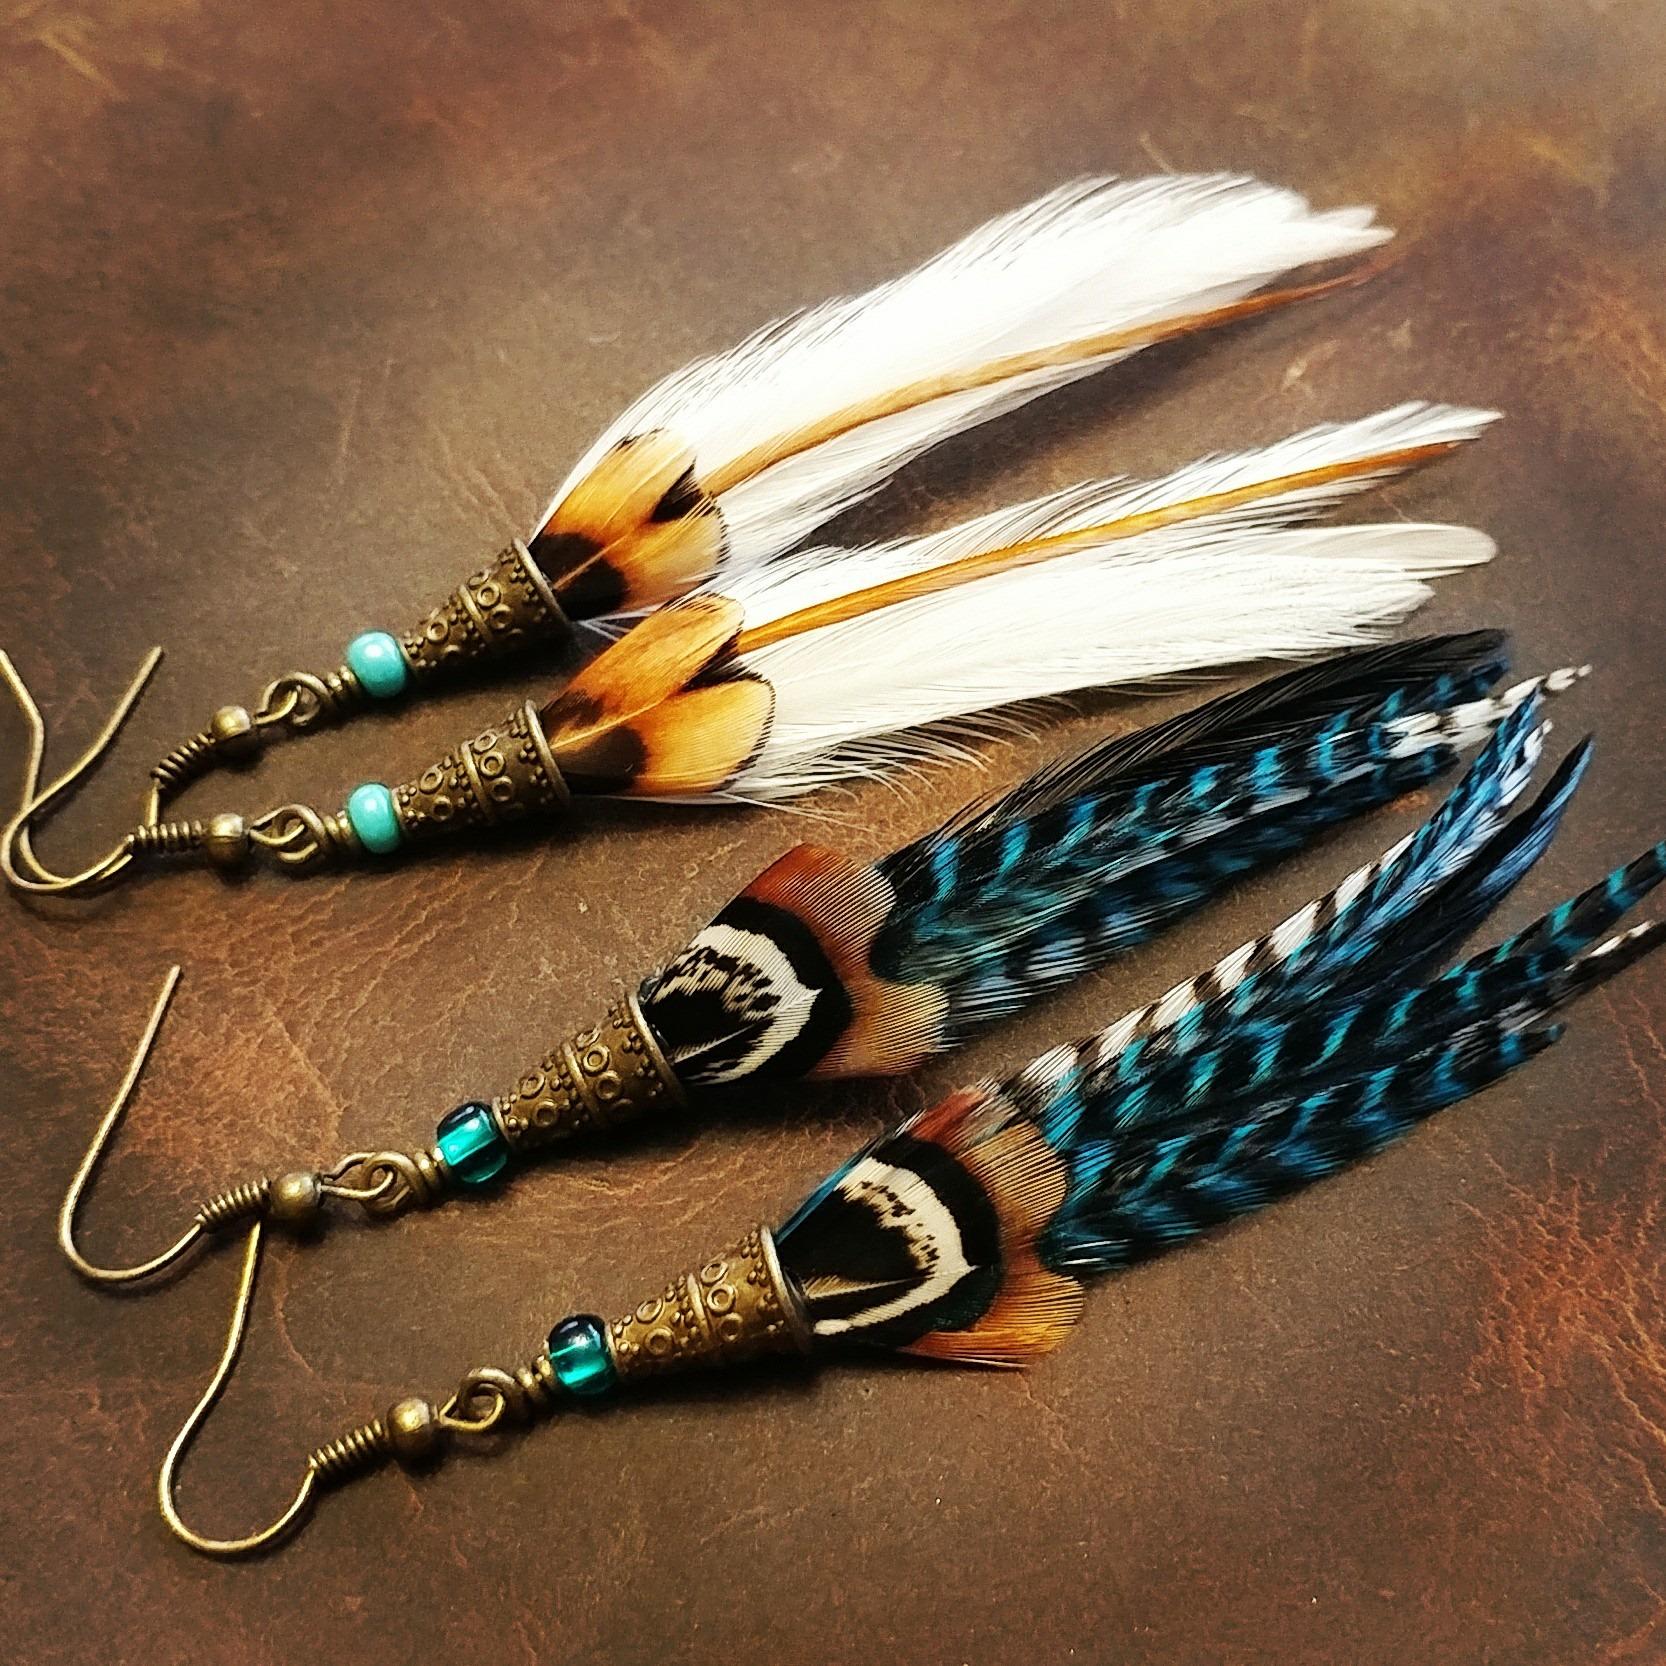 Axe & Sparrow at Rural Craft Revival